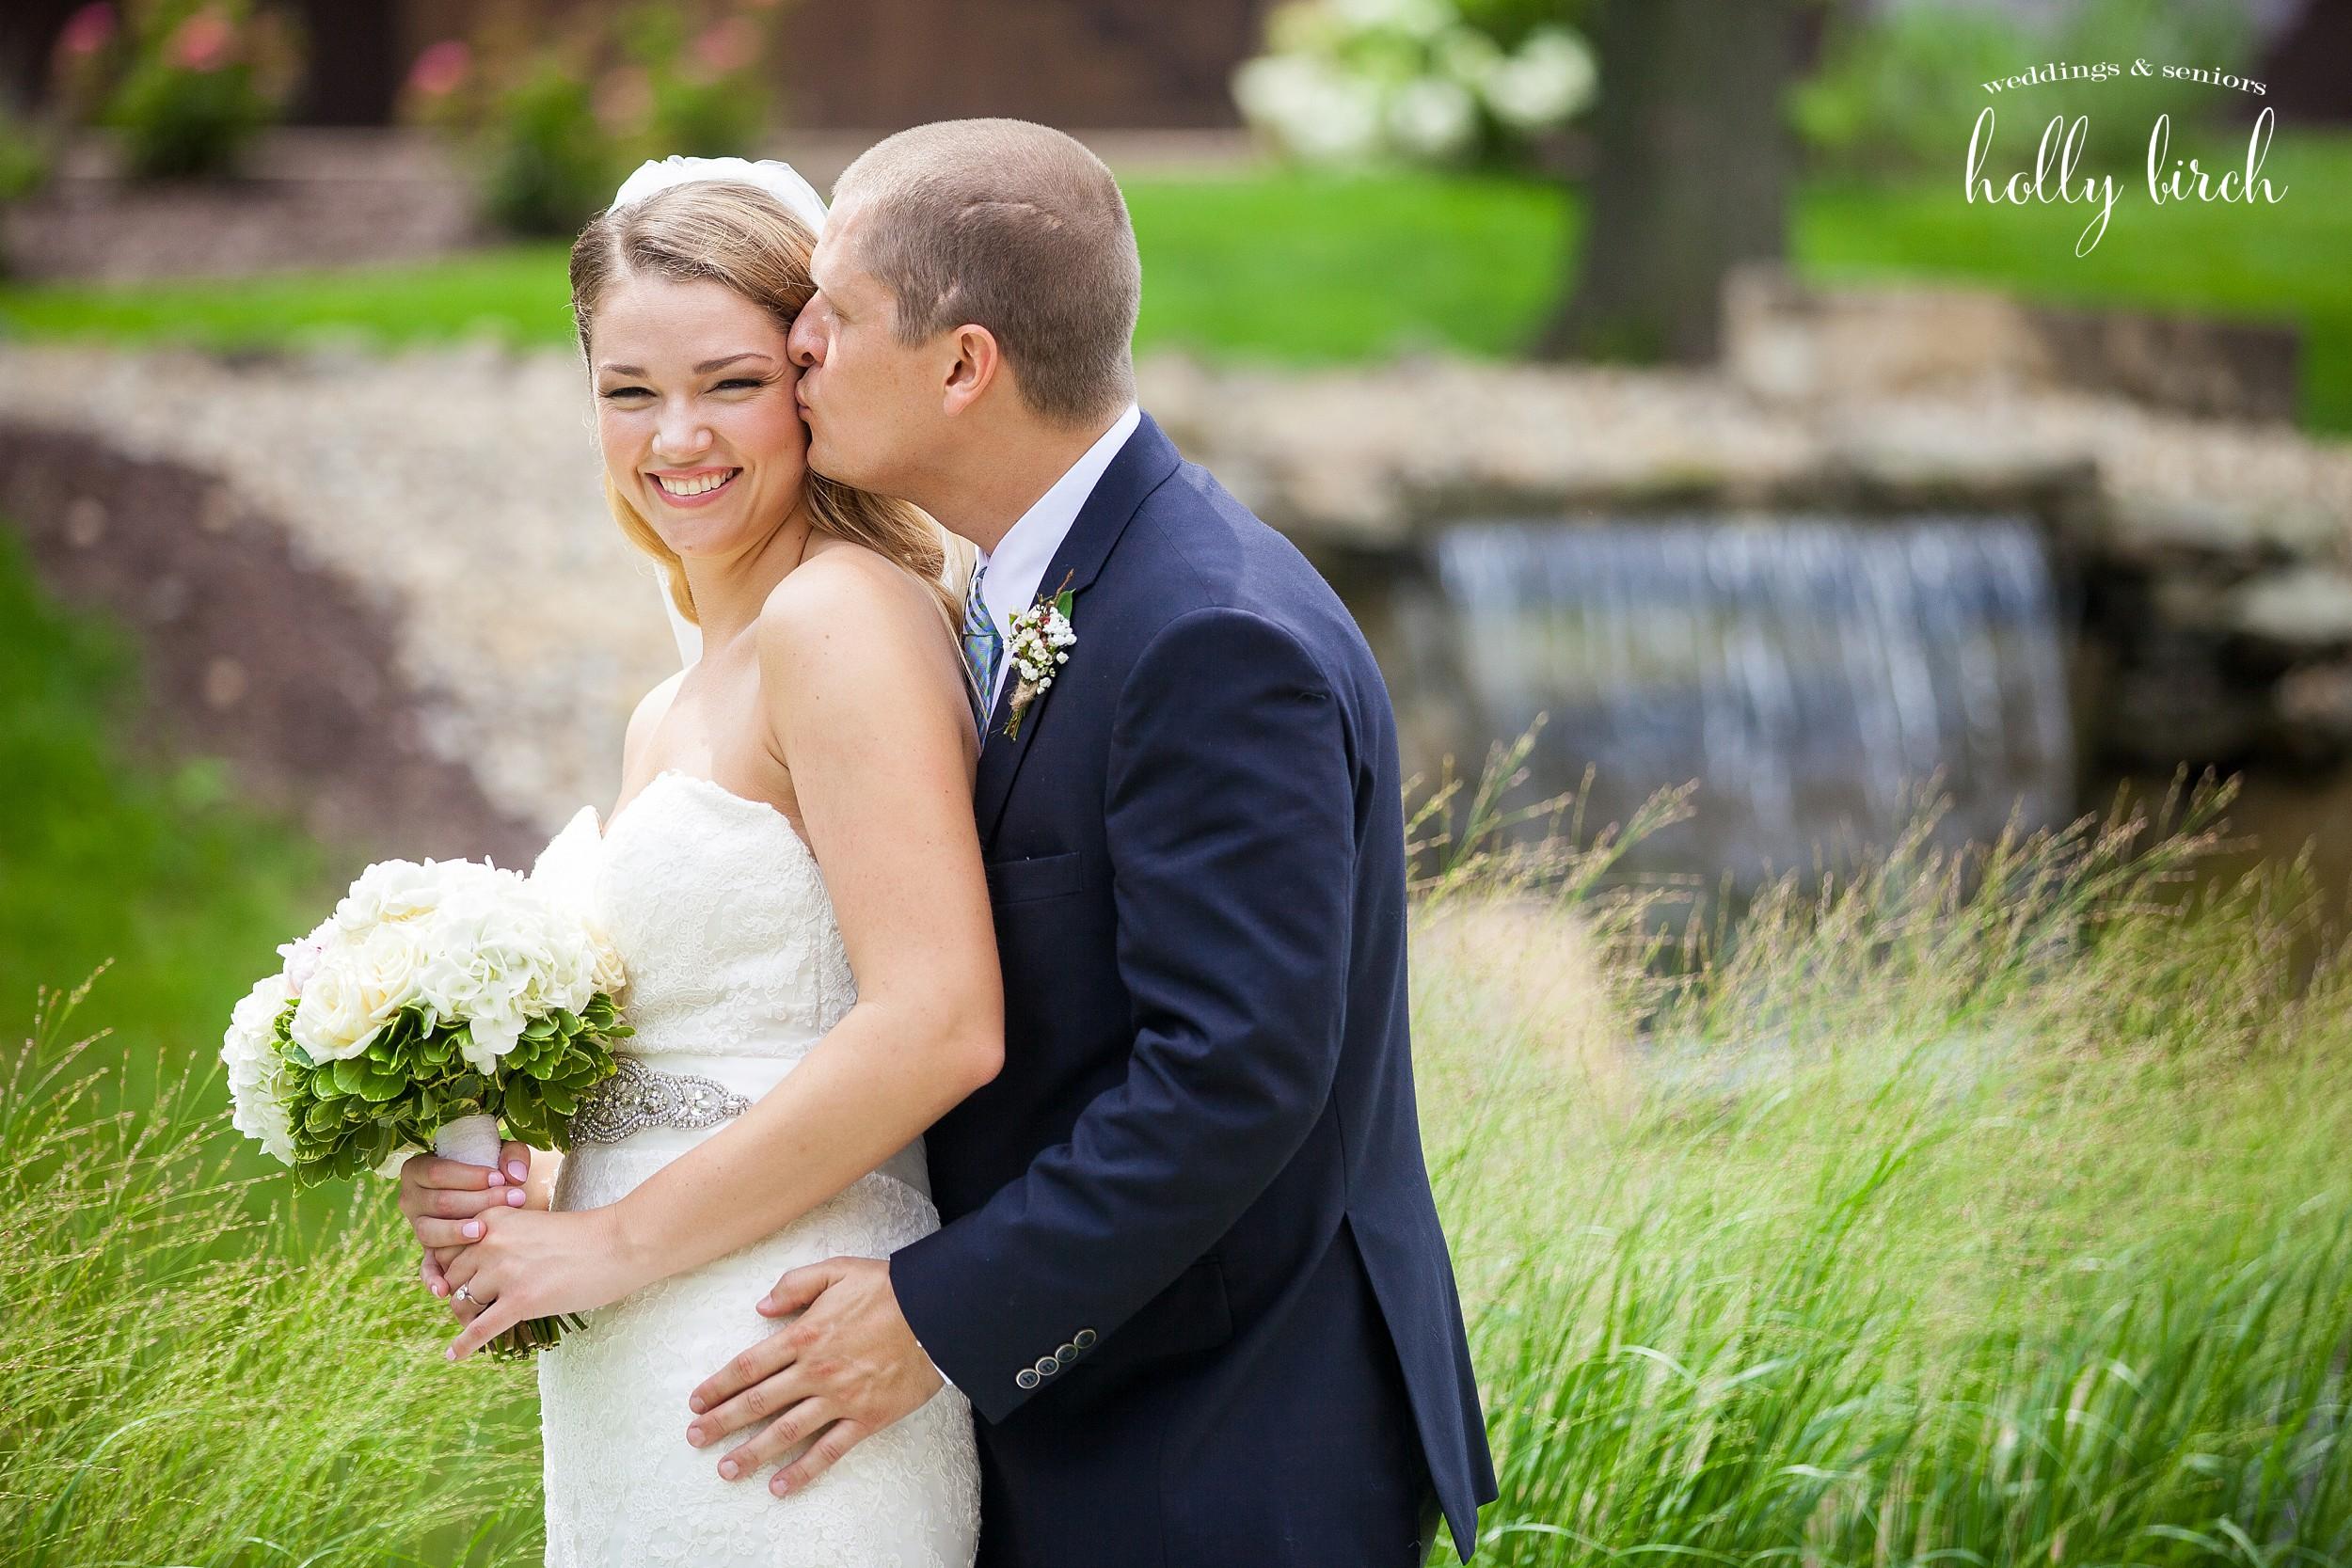 fun loving bride and groom